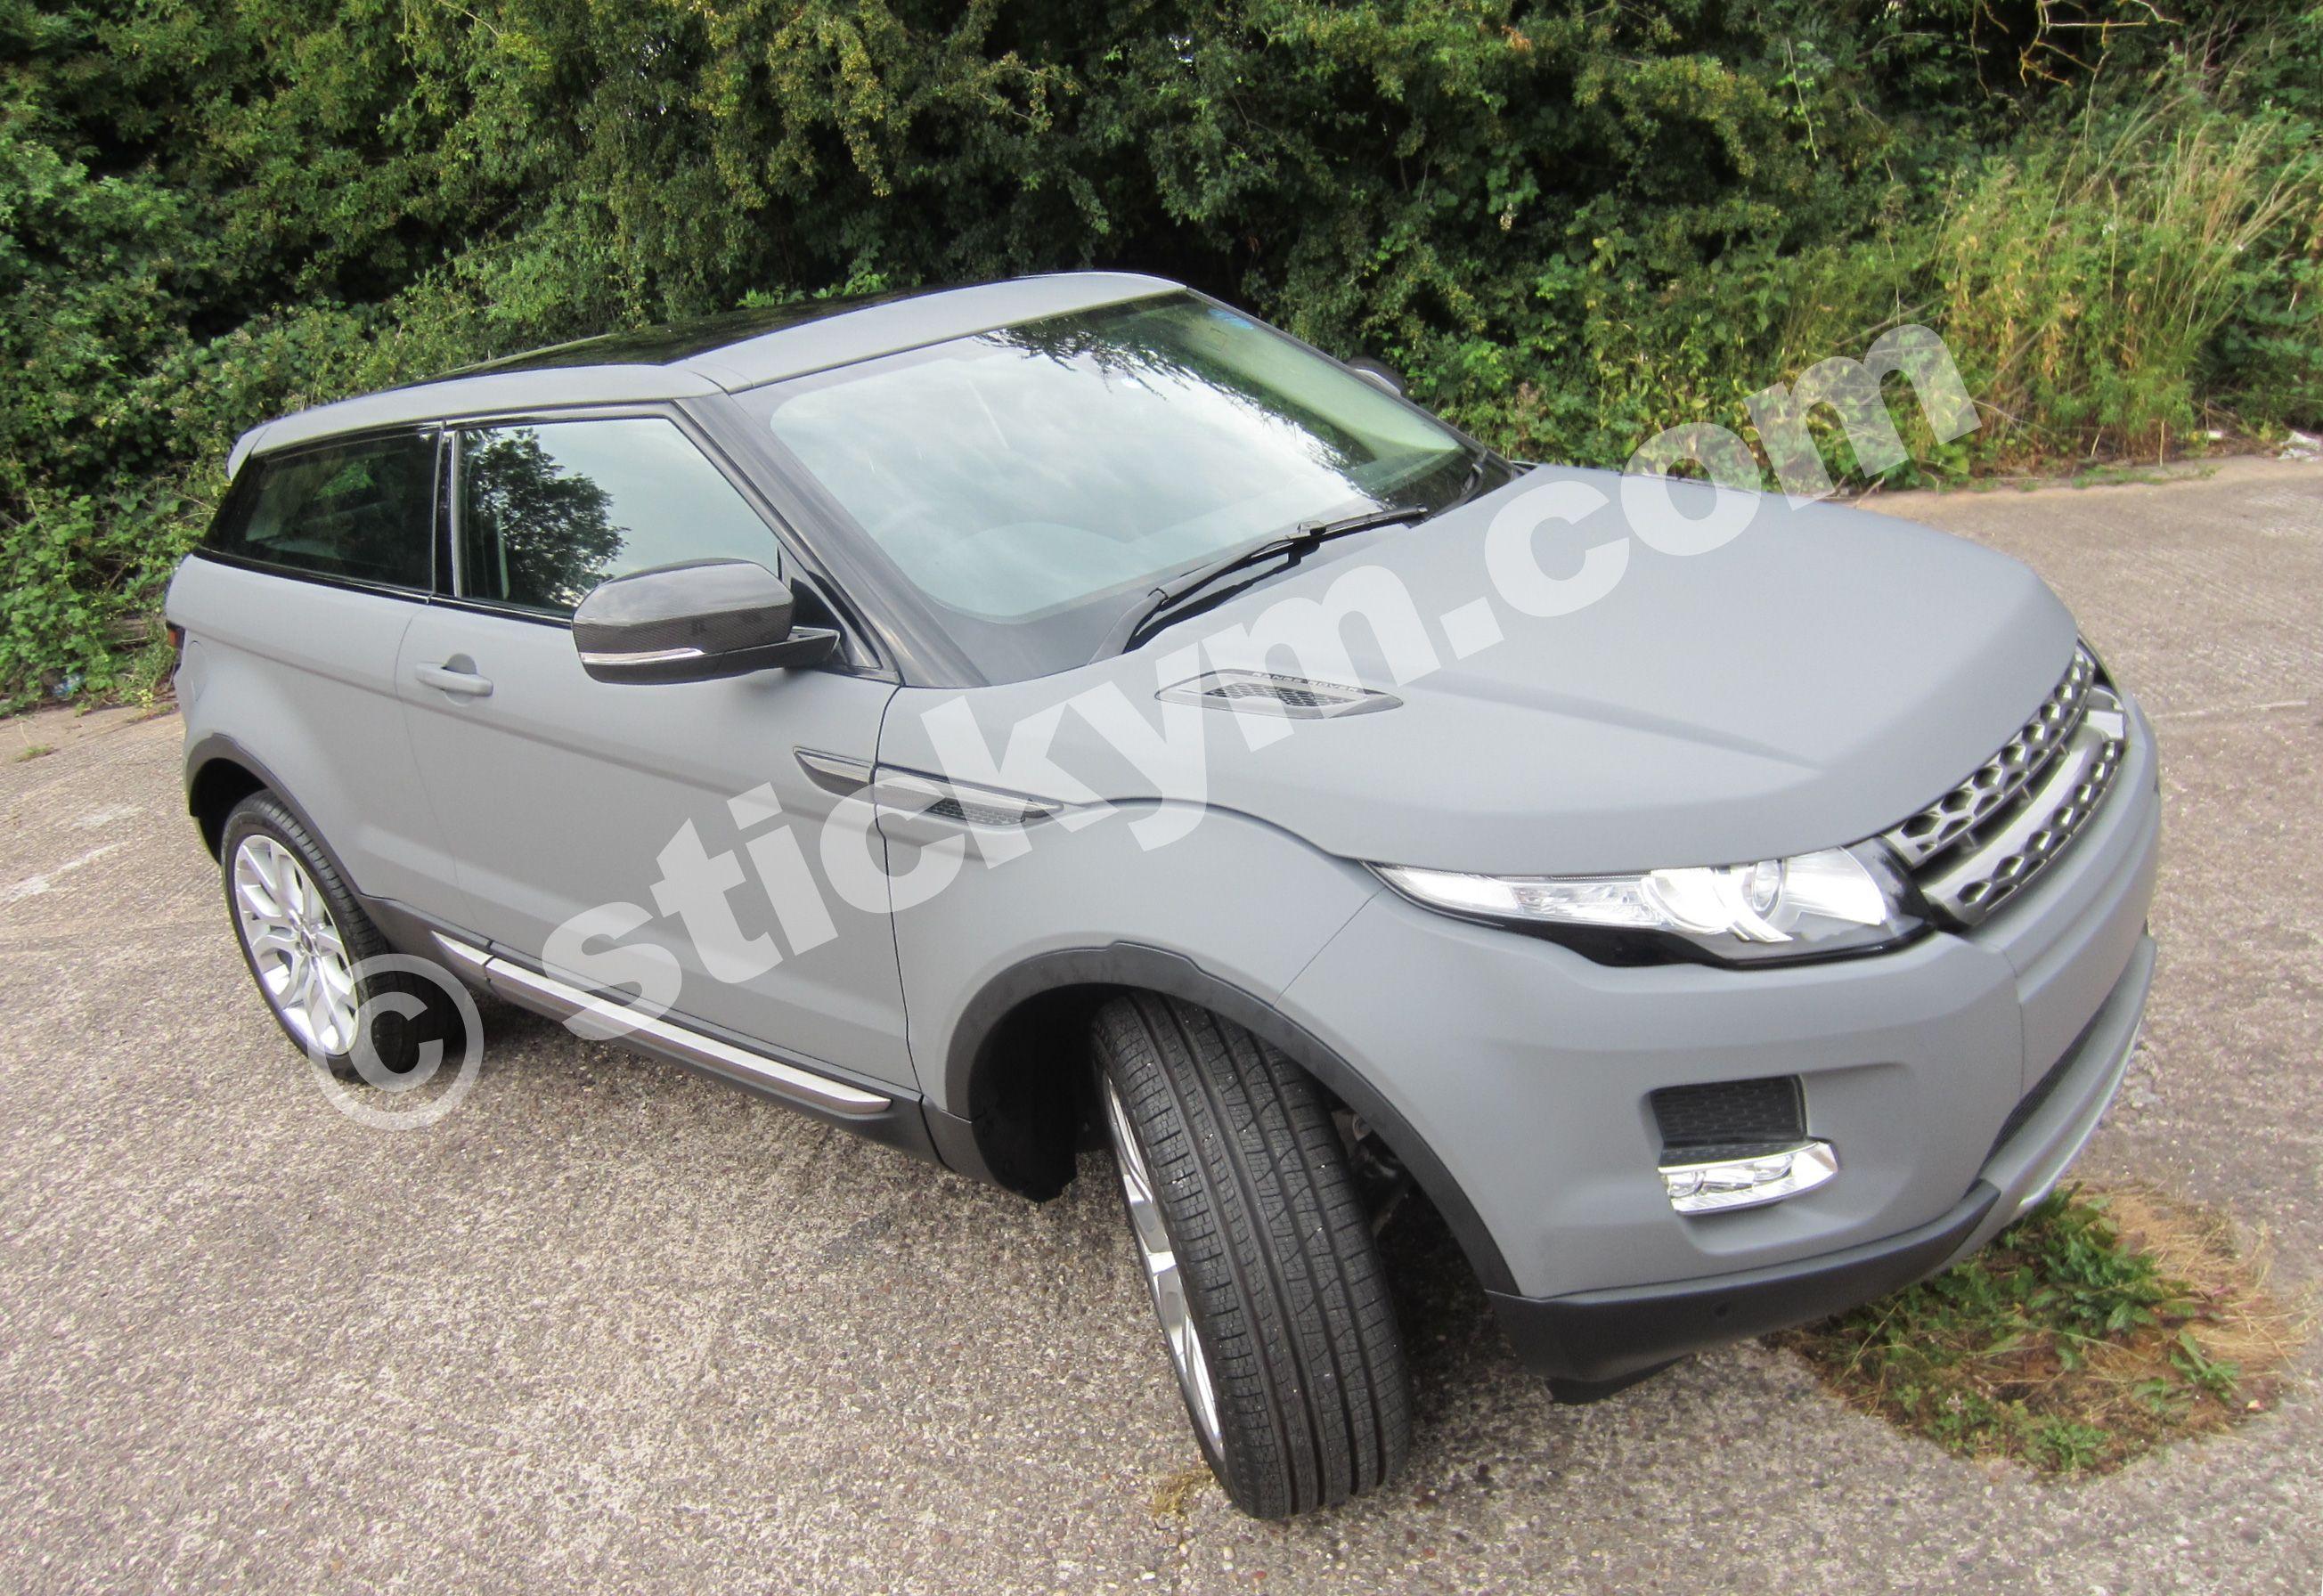 Full Matt Grey Wrap Of A Land Rover Evoque Land Rover Range Rover Evoque Car Wrap